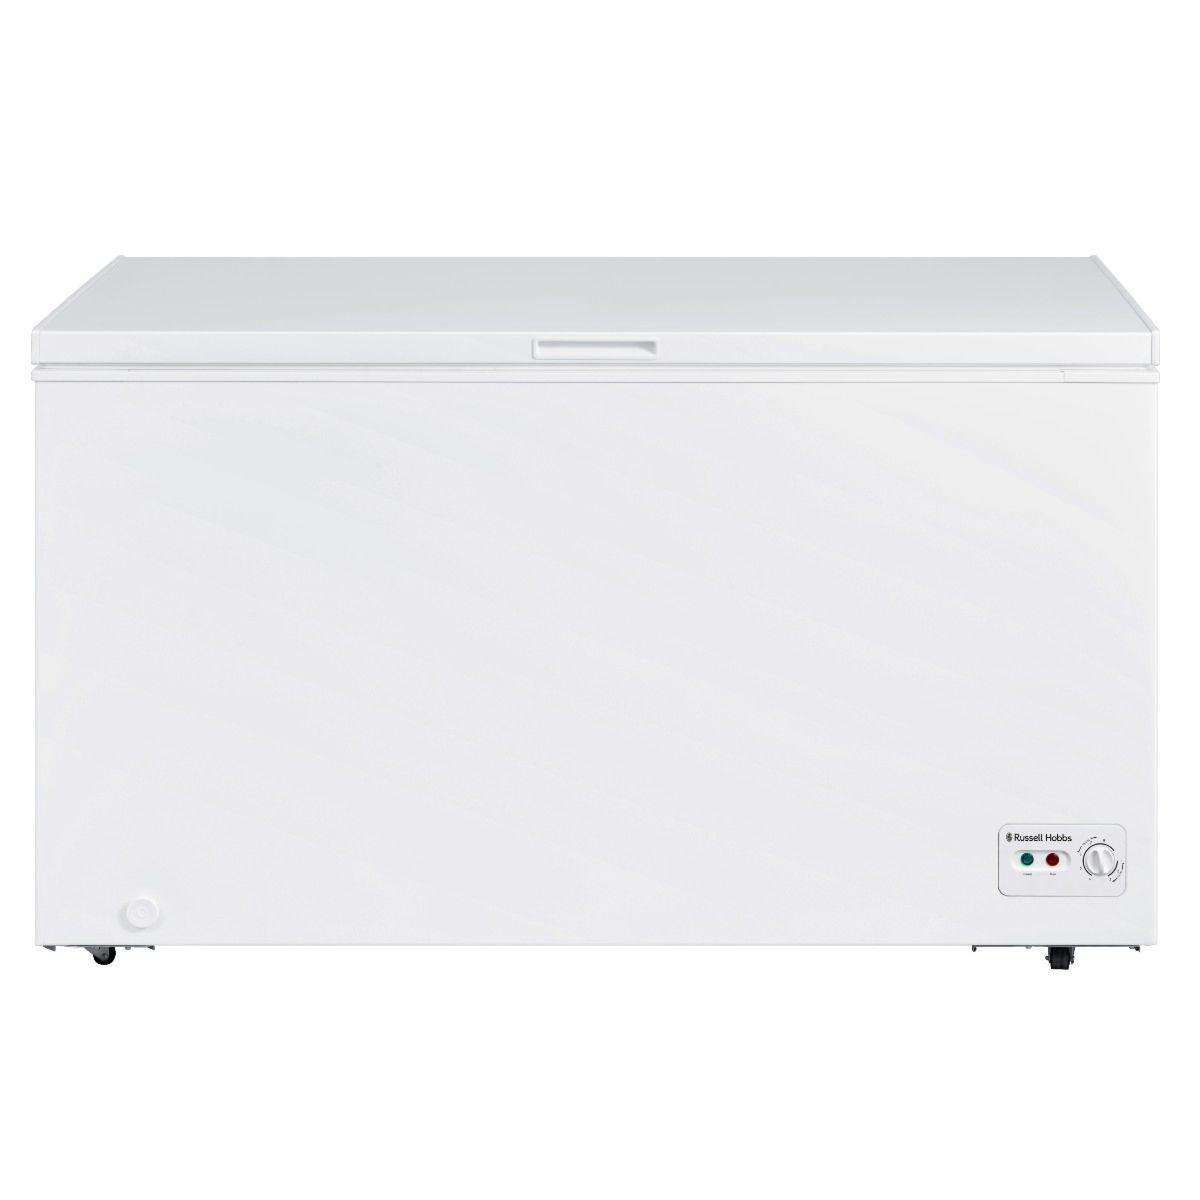 Russell Hobbs RHCF418 418L Chest Freezer - White